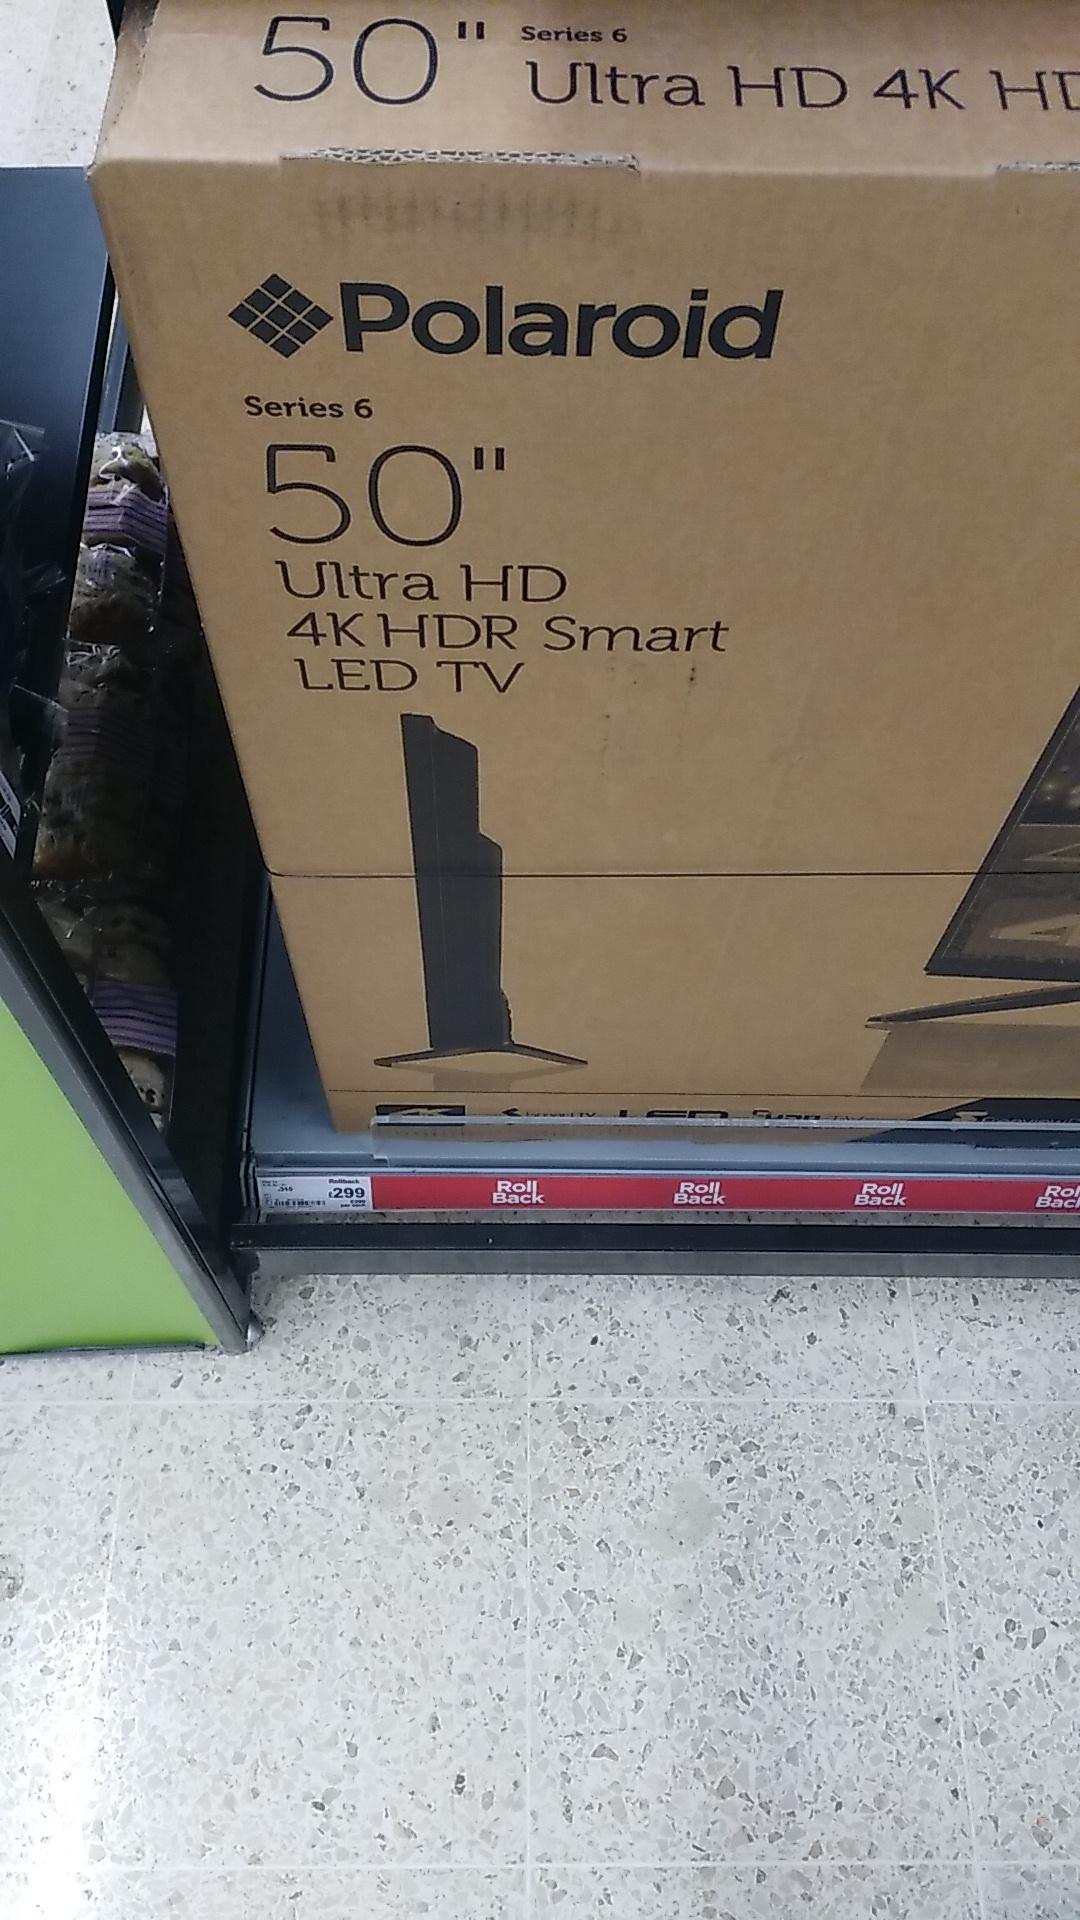 Polaroid P50US0956A 50 Inch SMART 4K Ultra HD LED TV £299 instore @ Asda